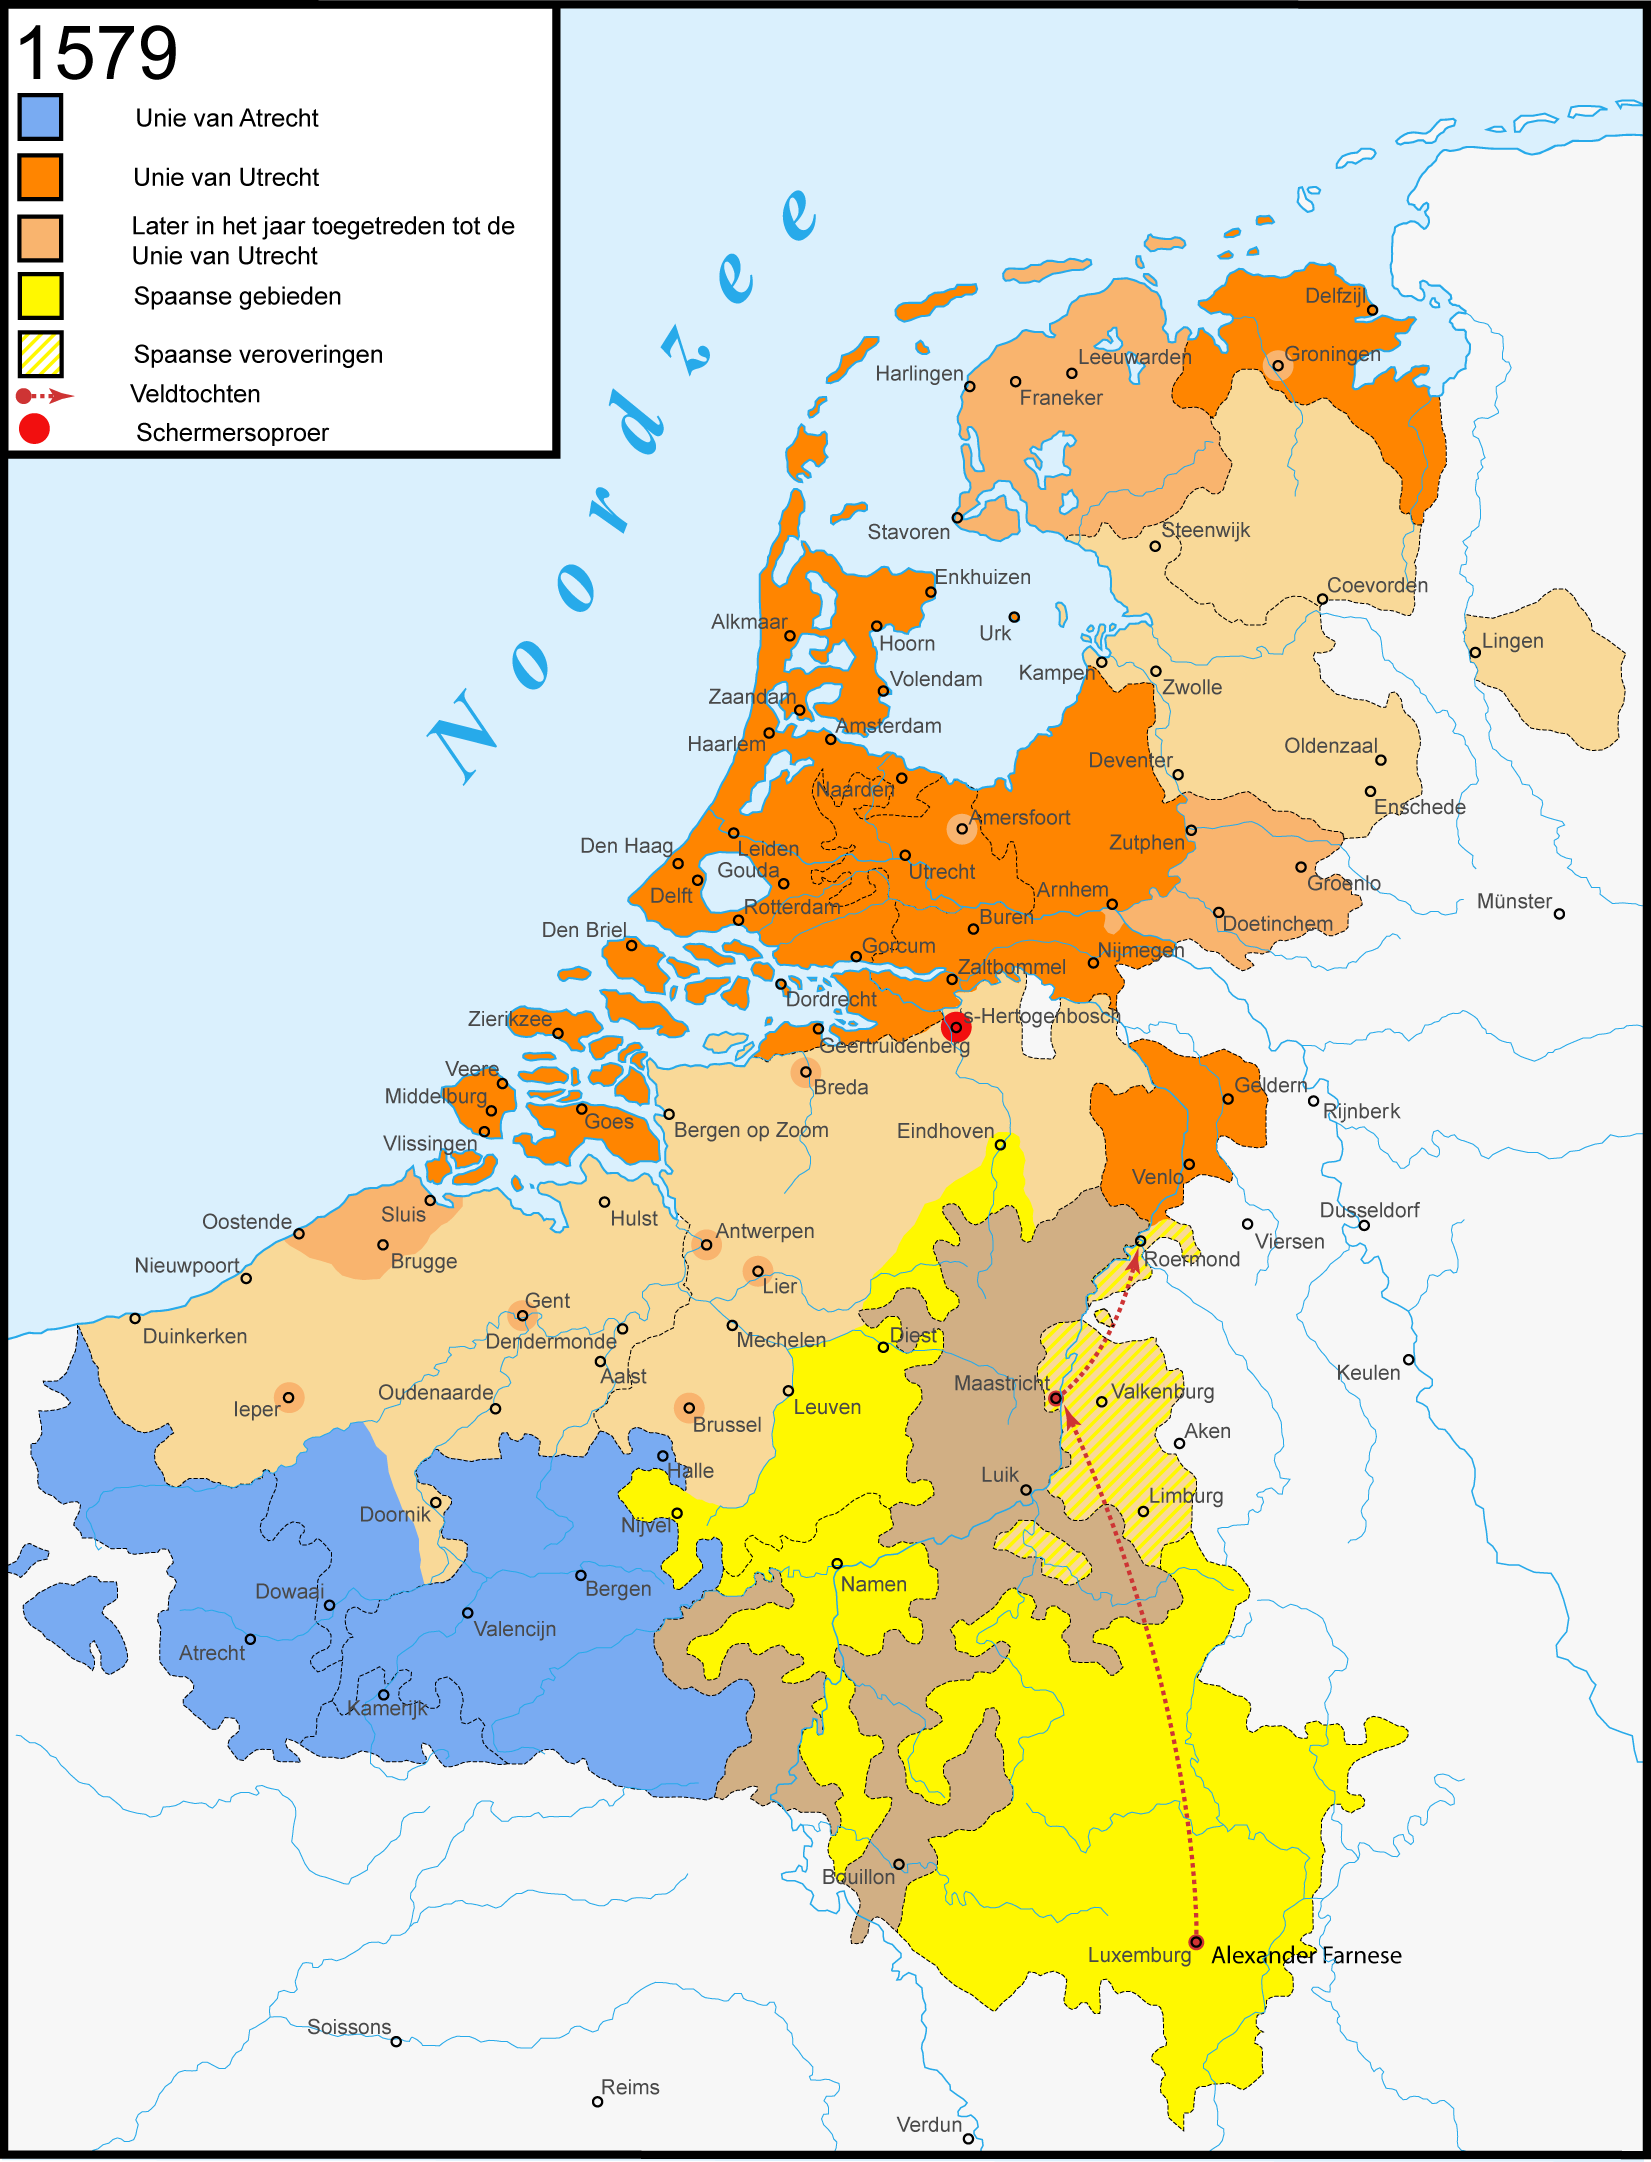 File:Tachtigjarigeoorlog-1579.png